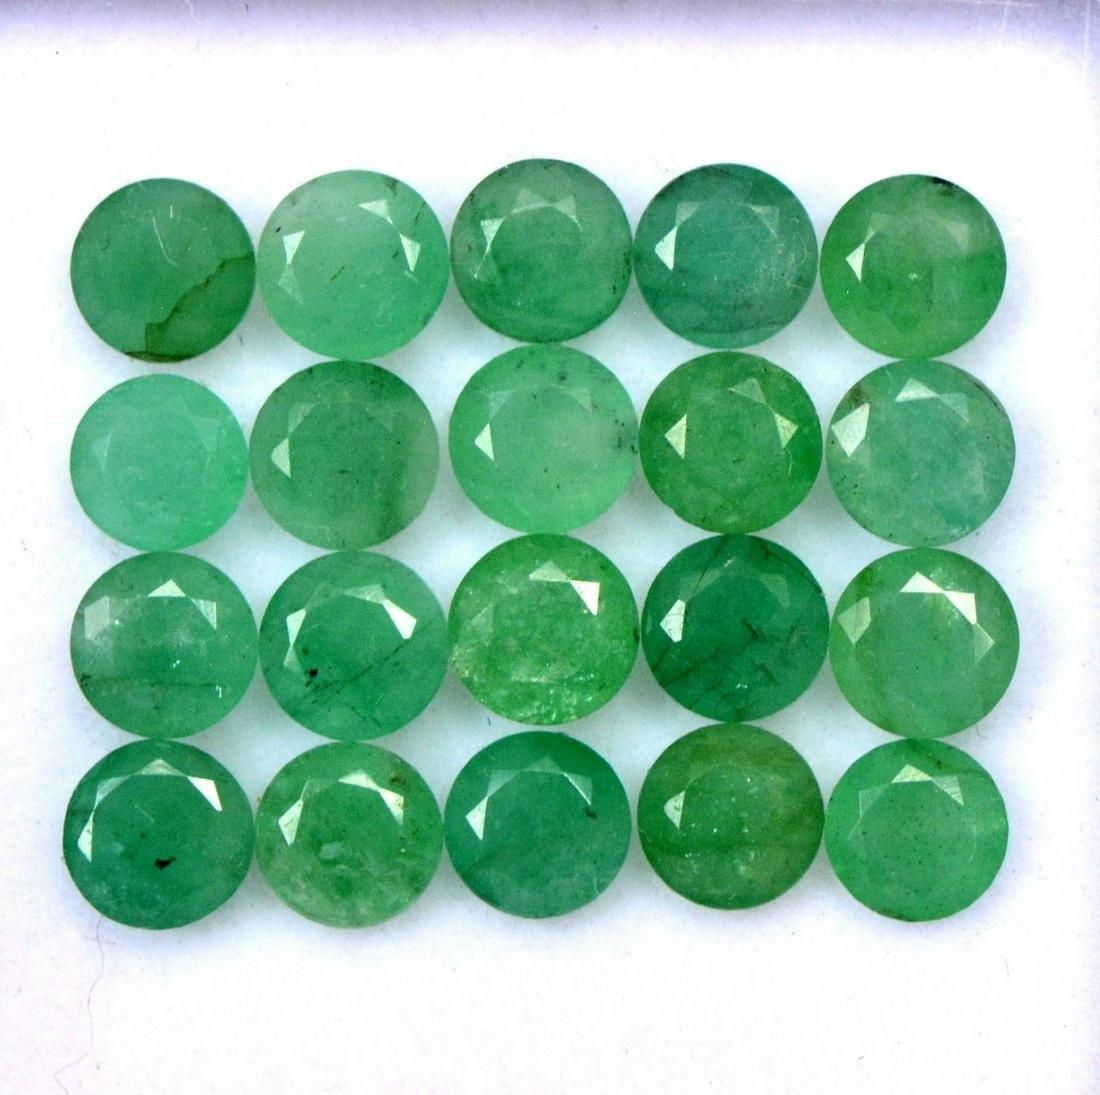 Natural Emerald 5 MM Round Cut Green Loose Gemstone Lot